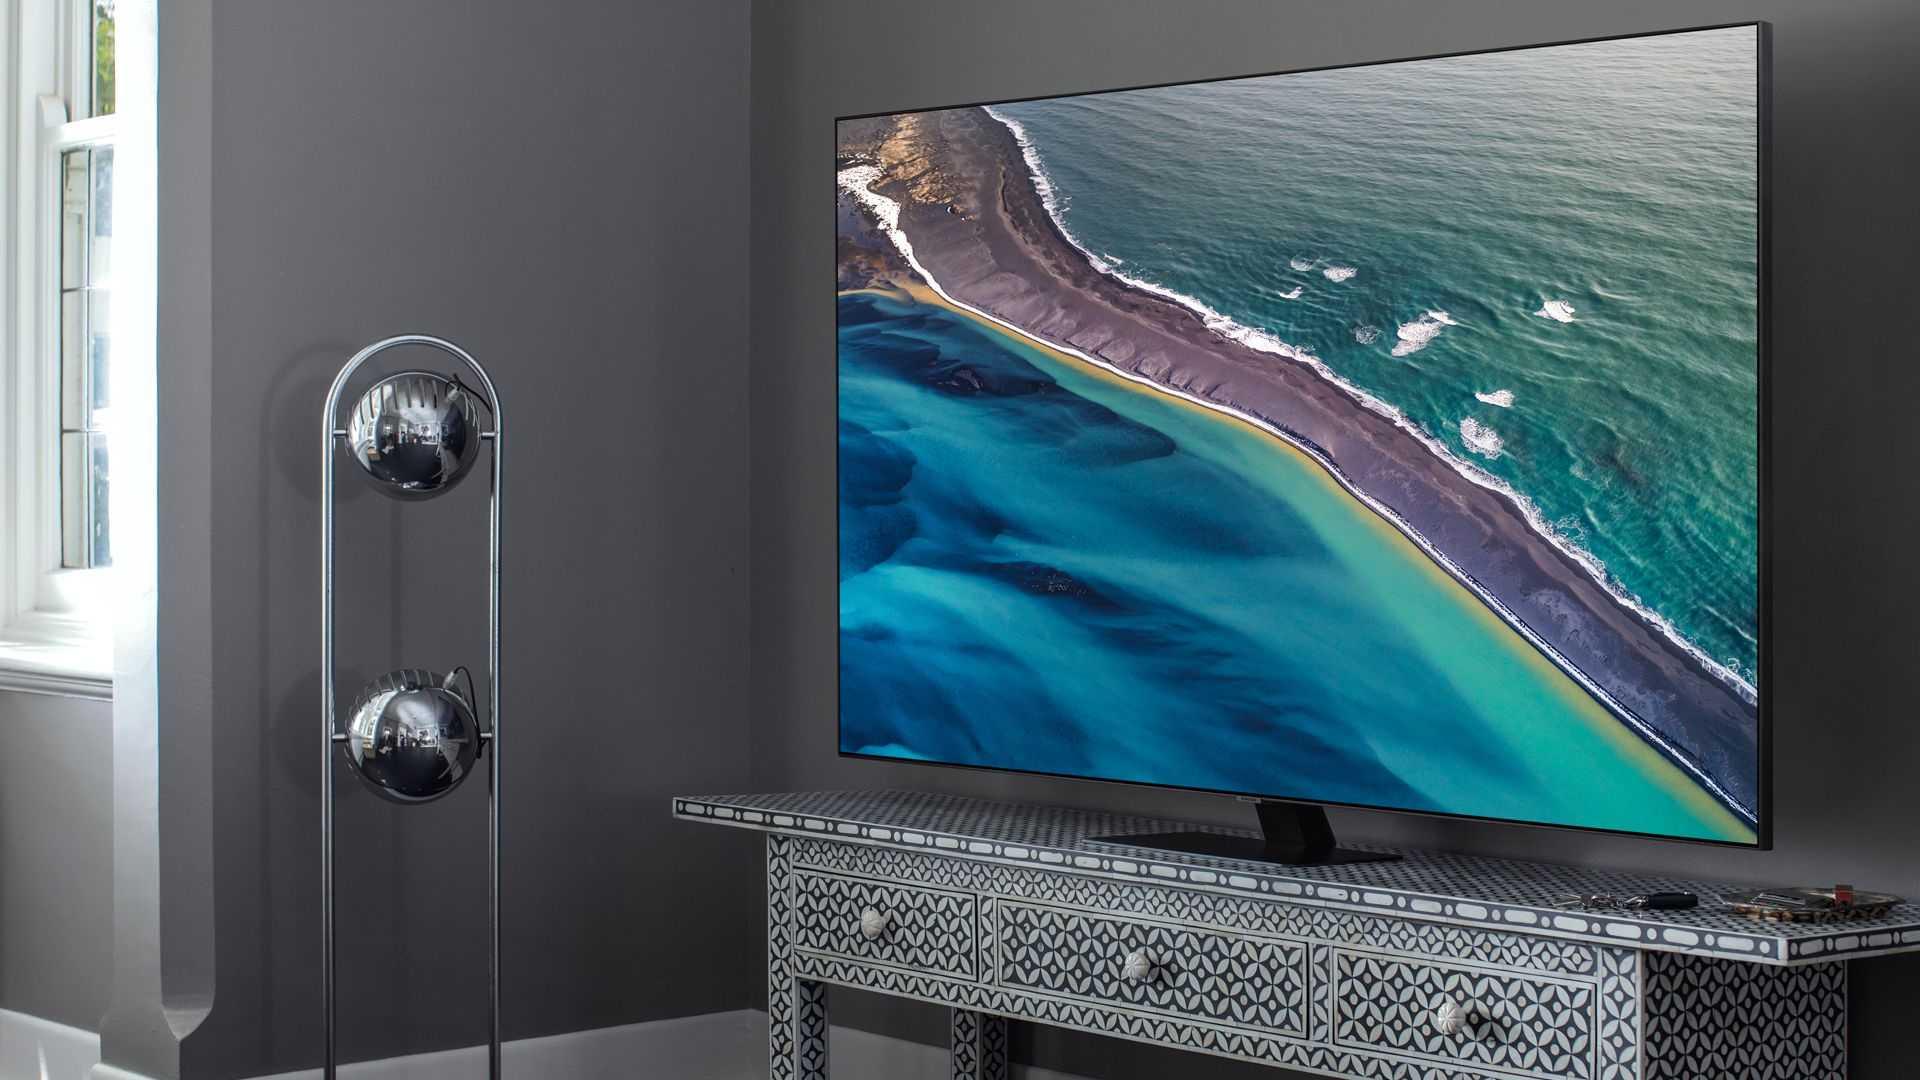 5 млн рублей за качество 8к мощнейший телевизор от samsung